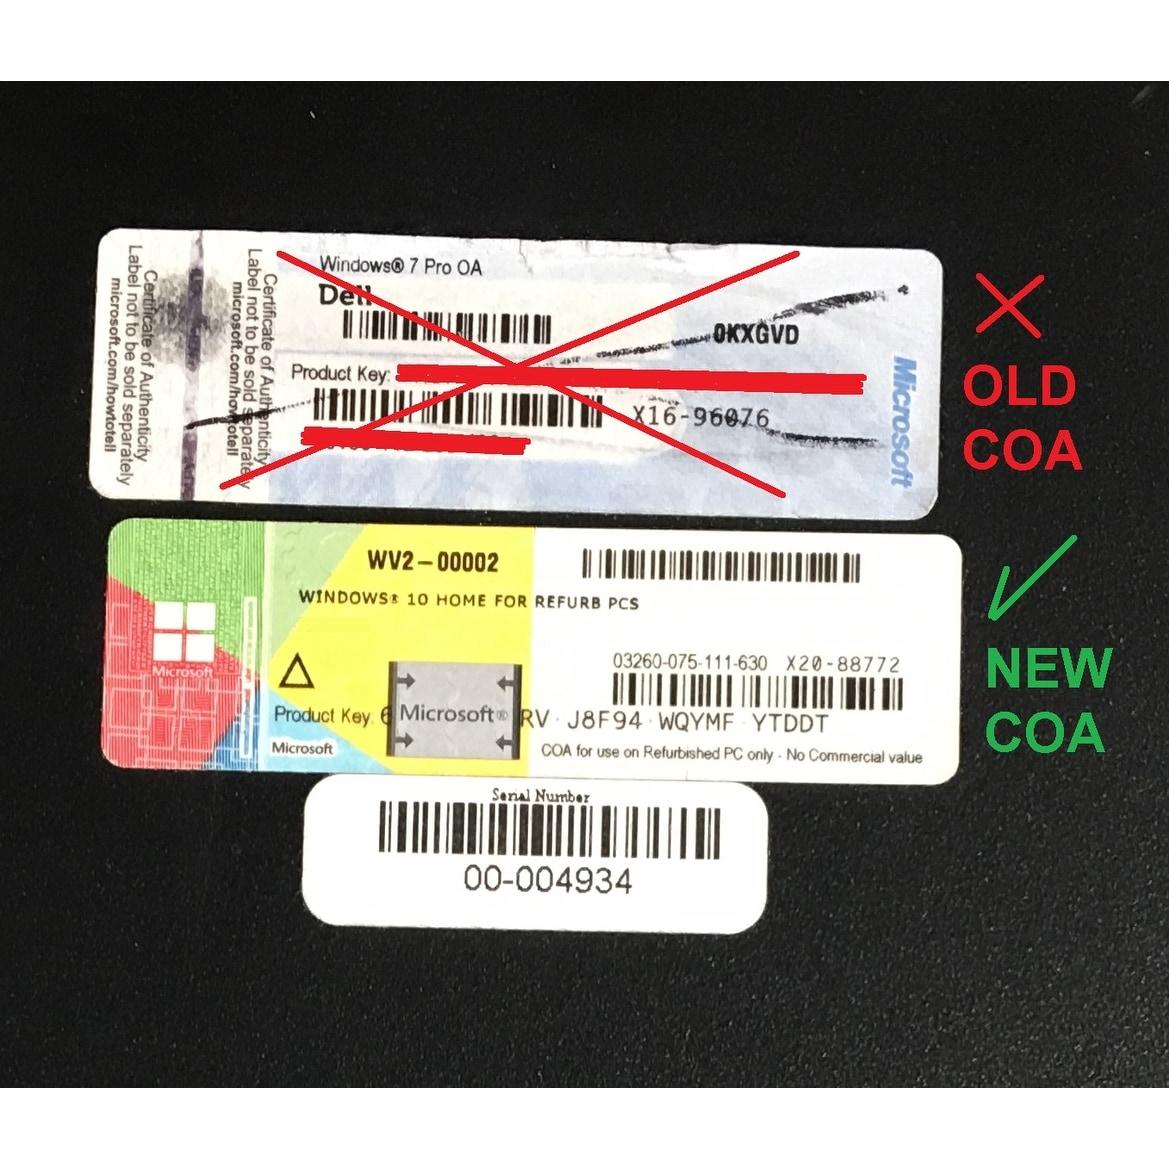 Shop Hp Compaq 6300 Pro Sff Standard Refurb Pc Intel I5 3470 3rd Windows 10 Coa Gen 32 Ghz 8gb Dimm Ddr3 Sata 35 2tb Dvd Rom Free Shipping Today